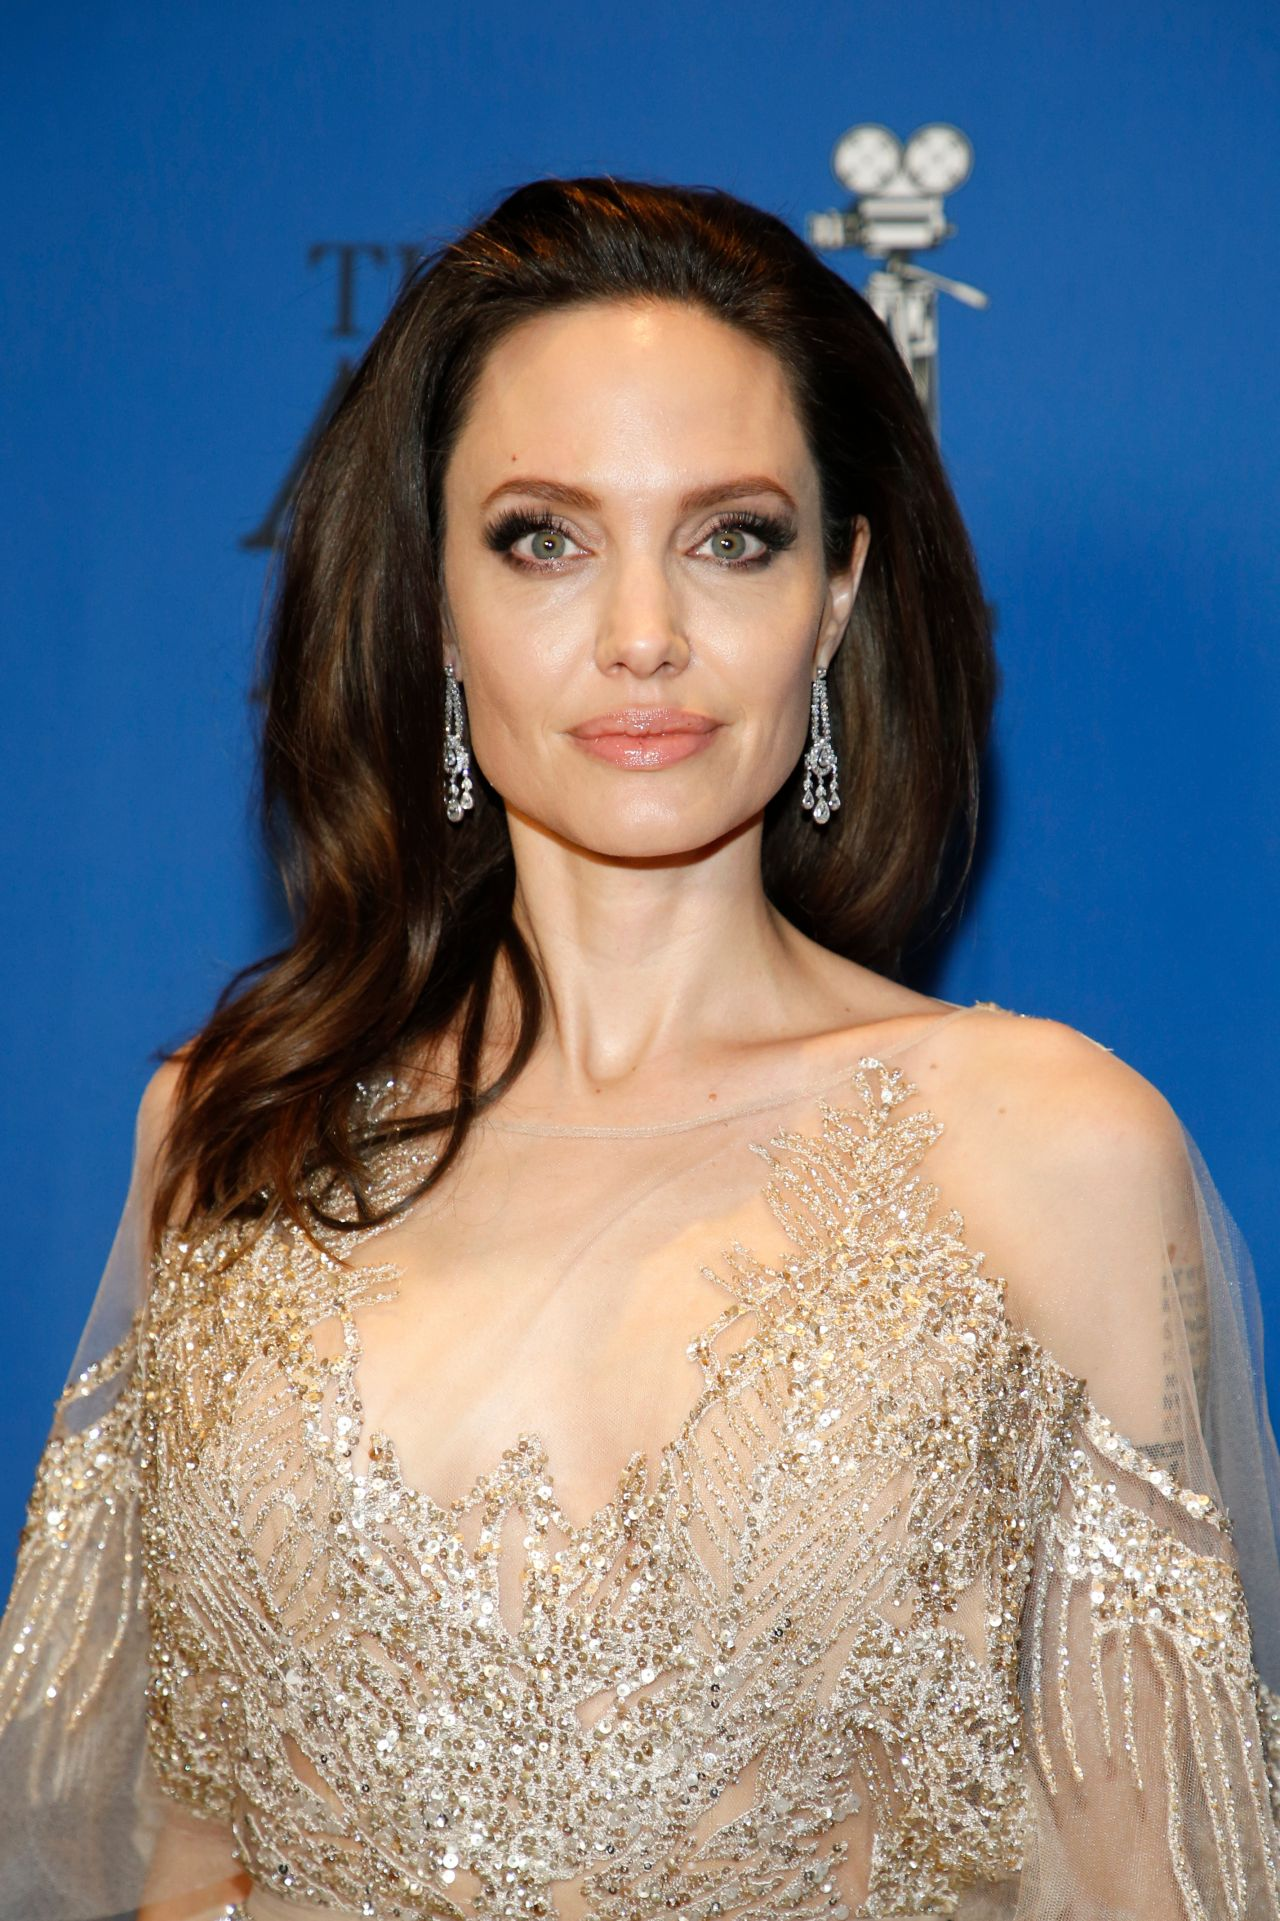 Angelina Jolie - 2018 ASC Awards in LA Angelina Jolie